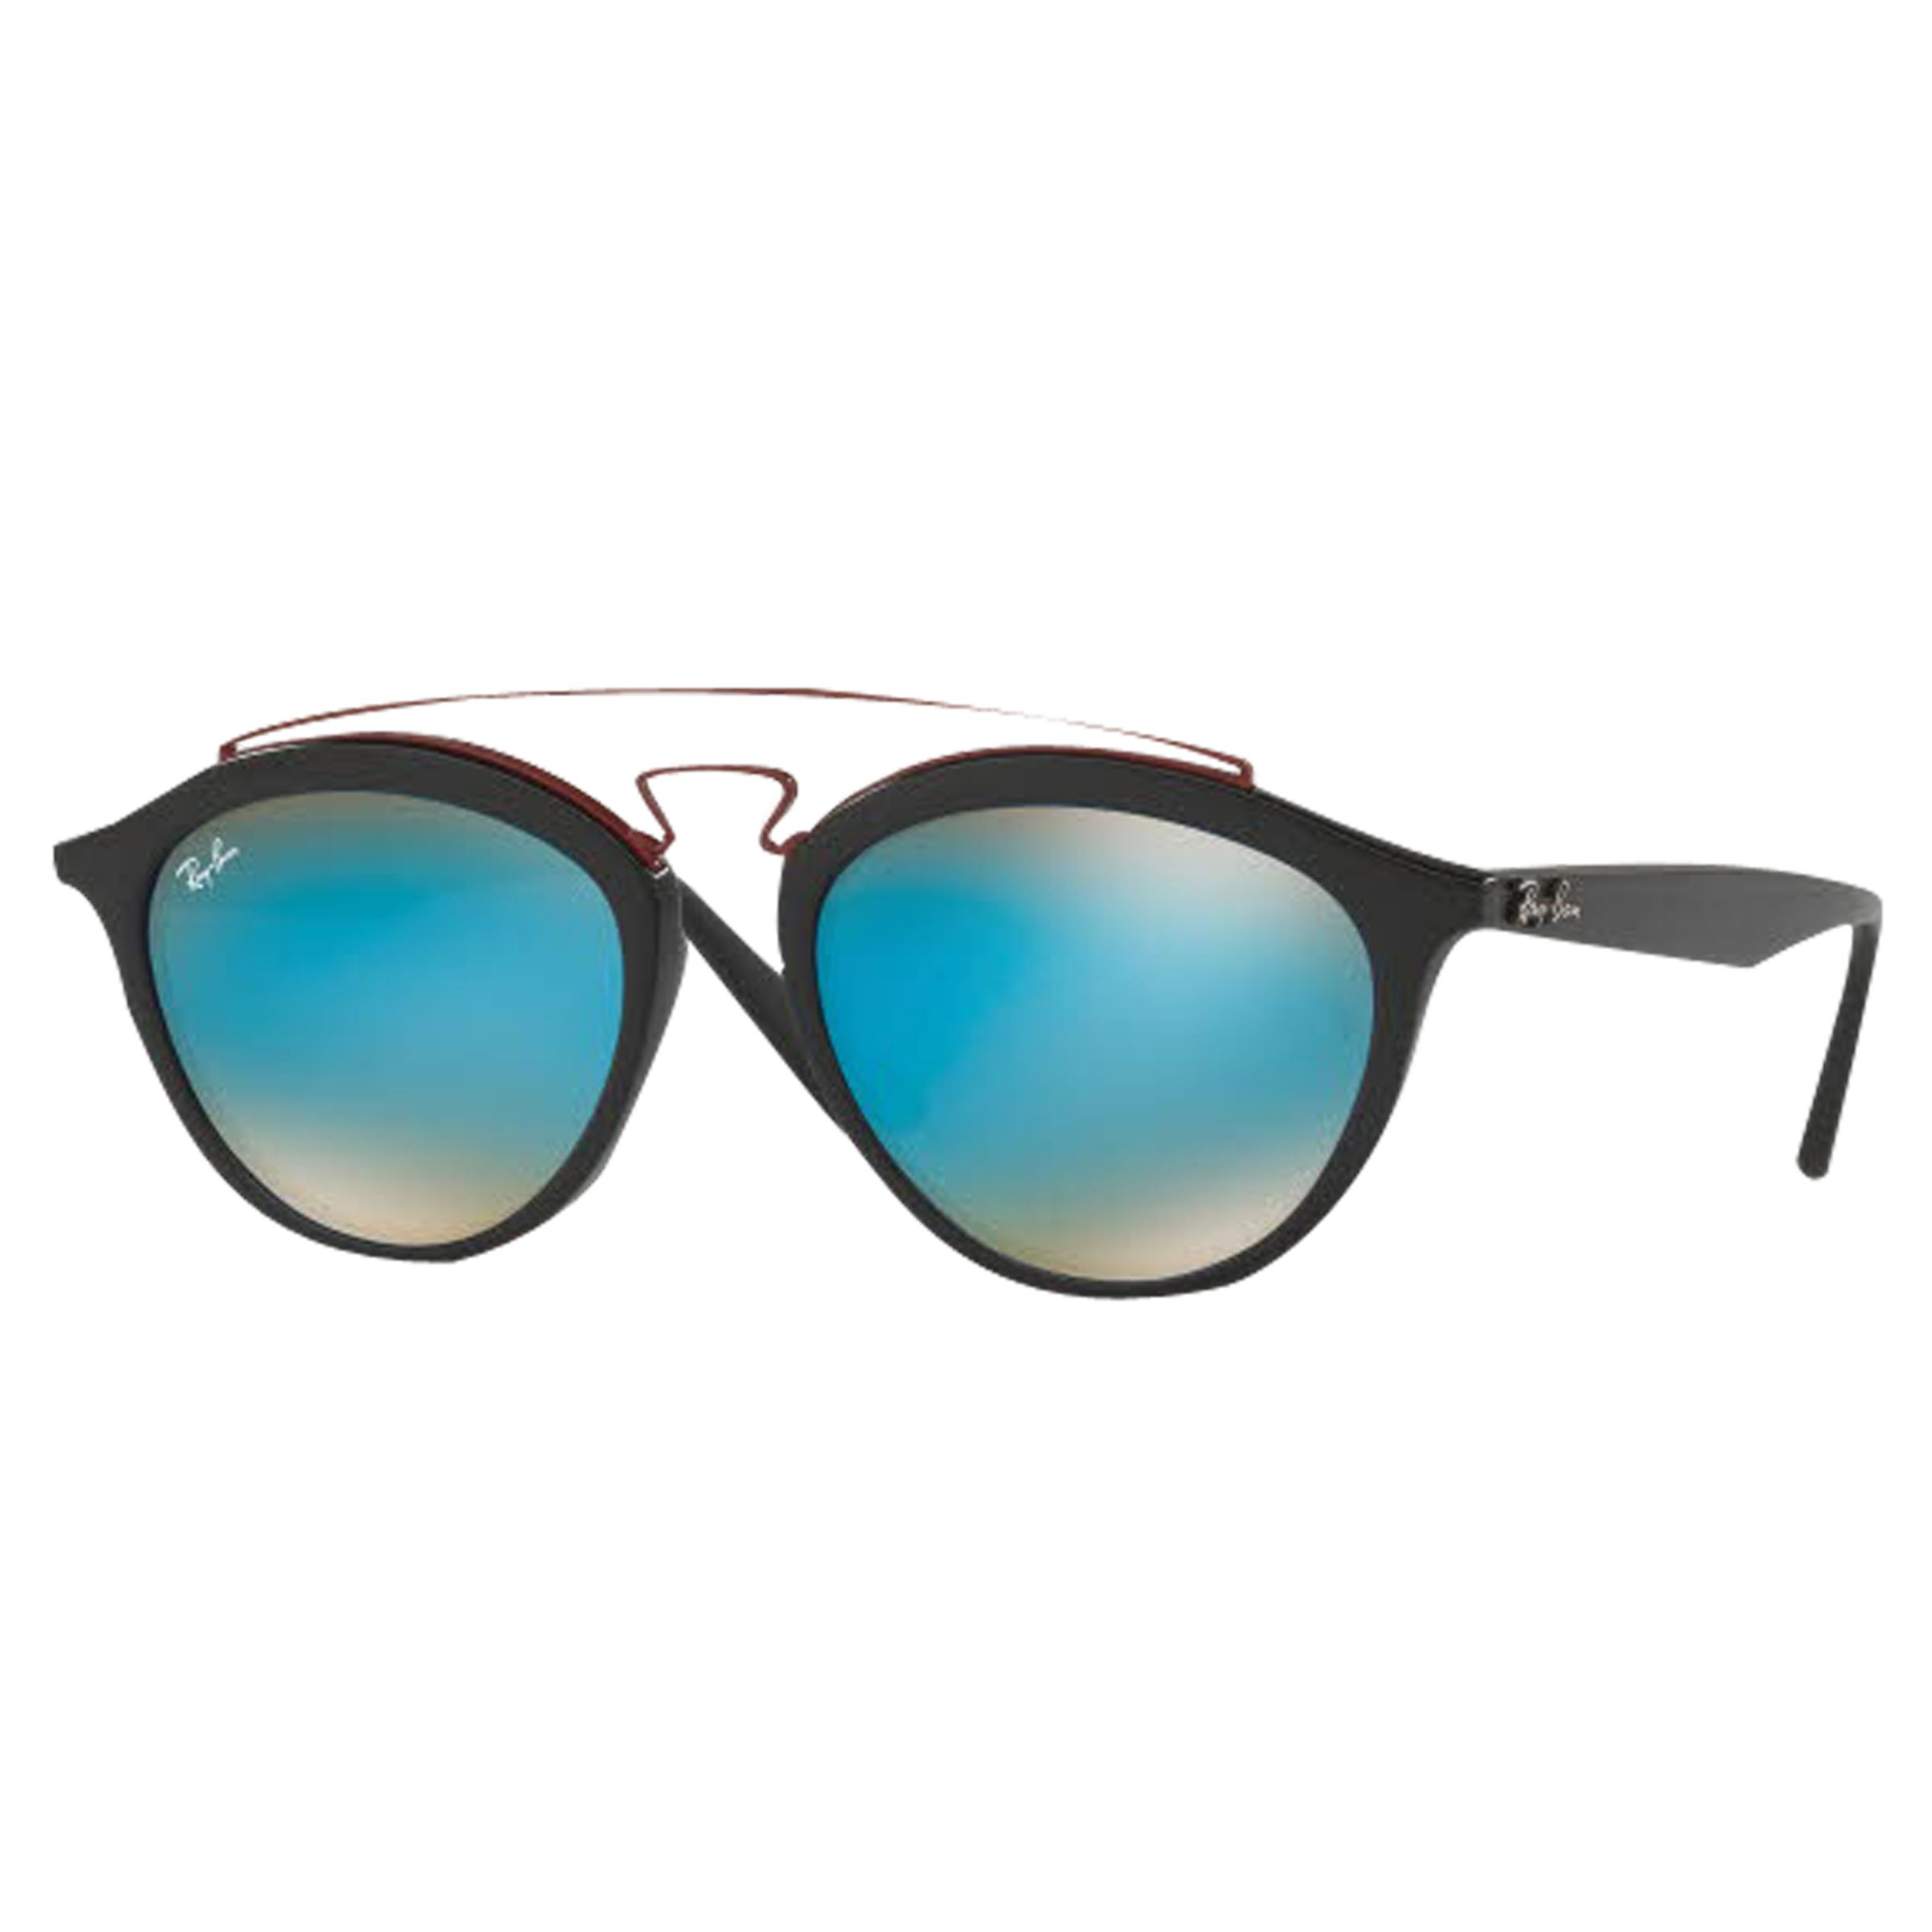 f076515e62 Ray-Ban RB4257 Oval Sunglasses